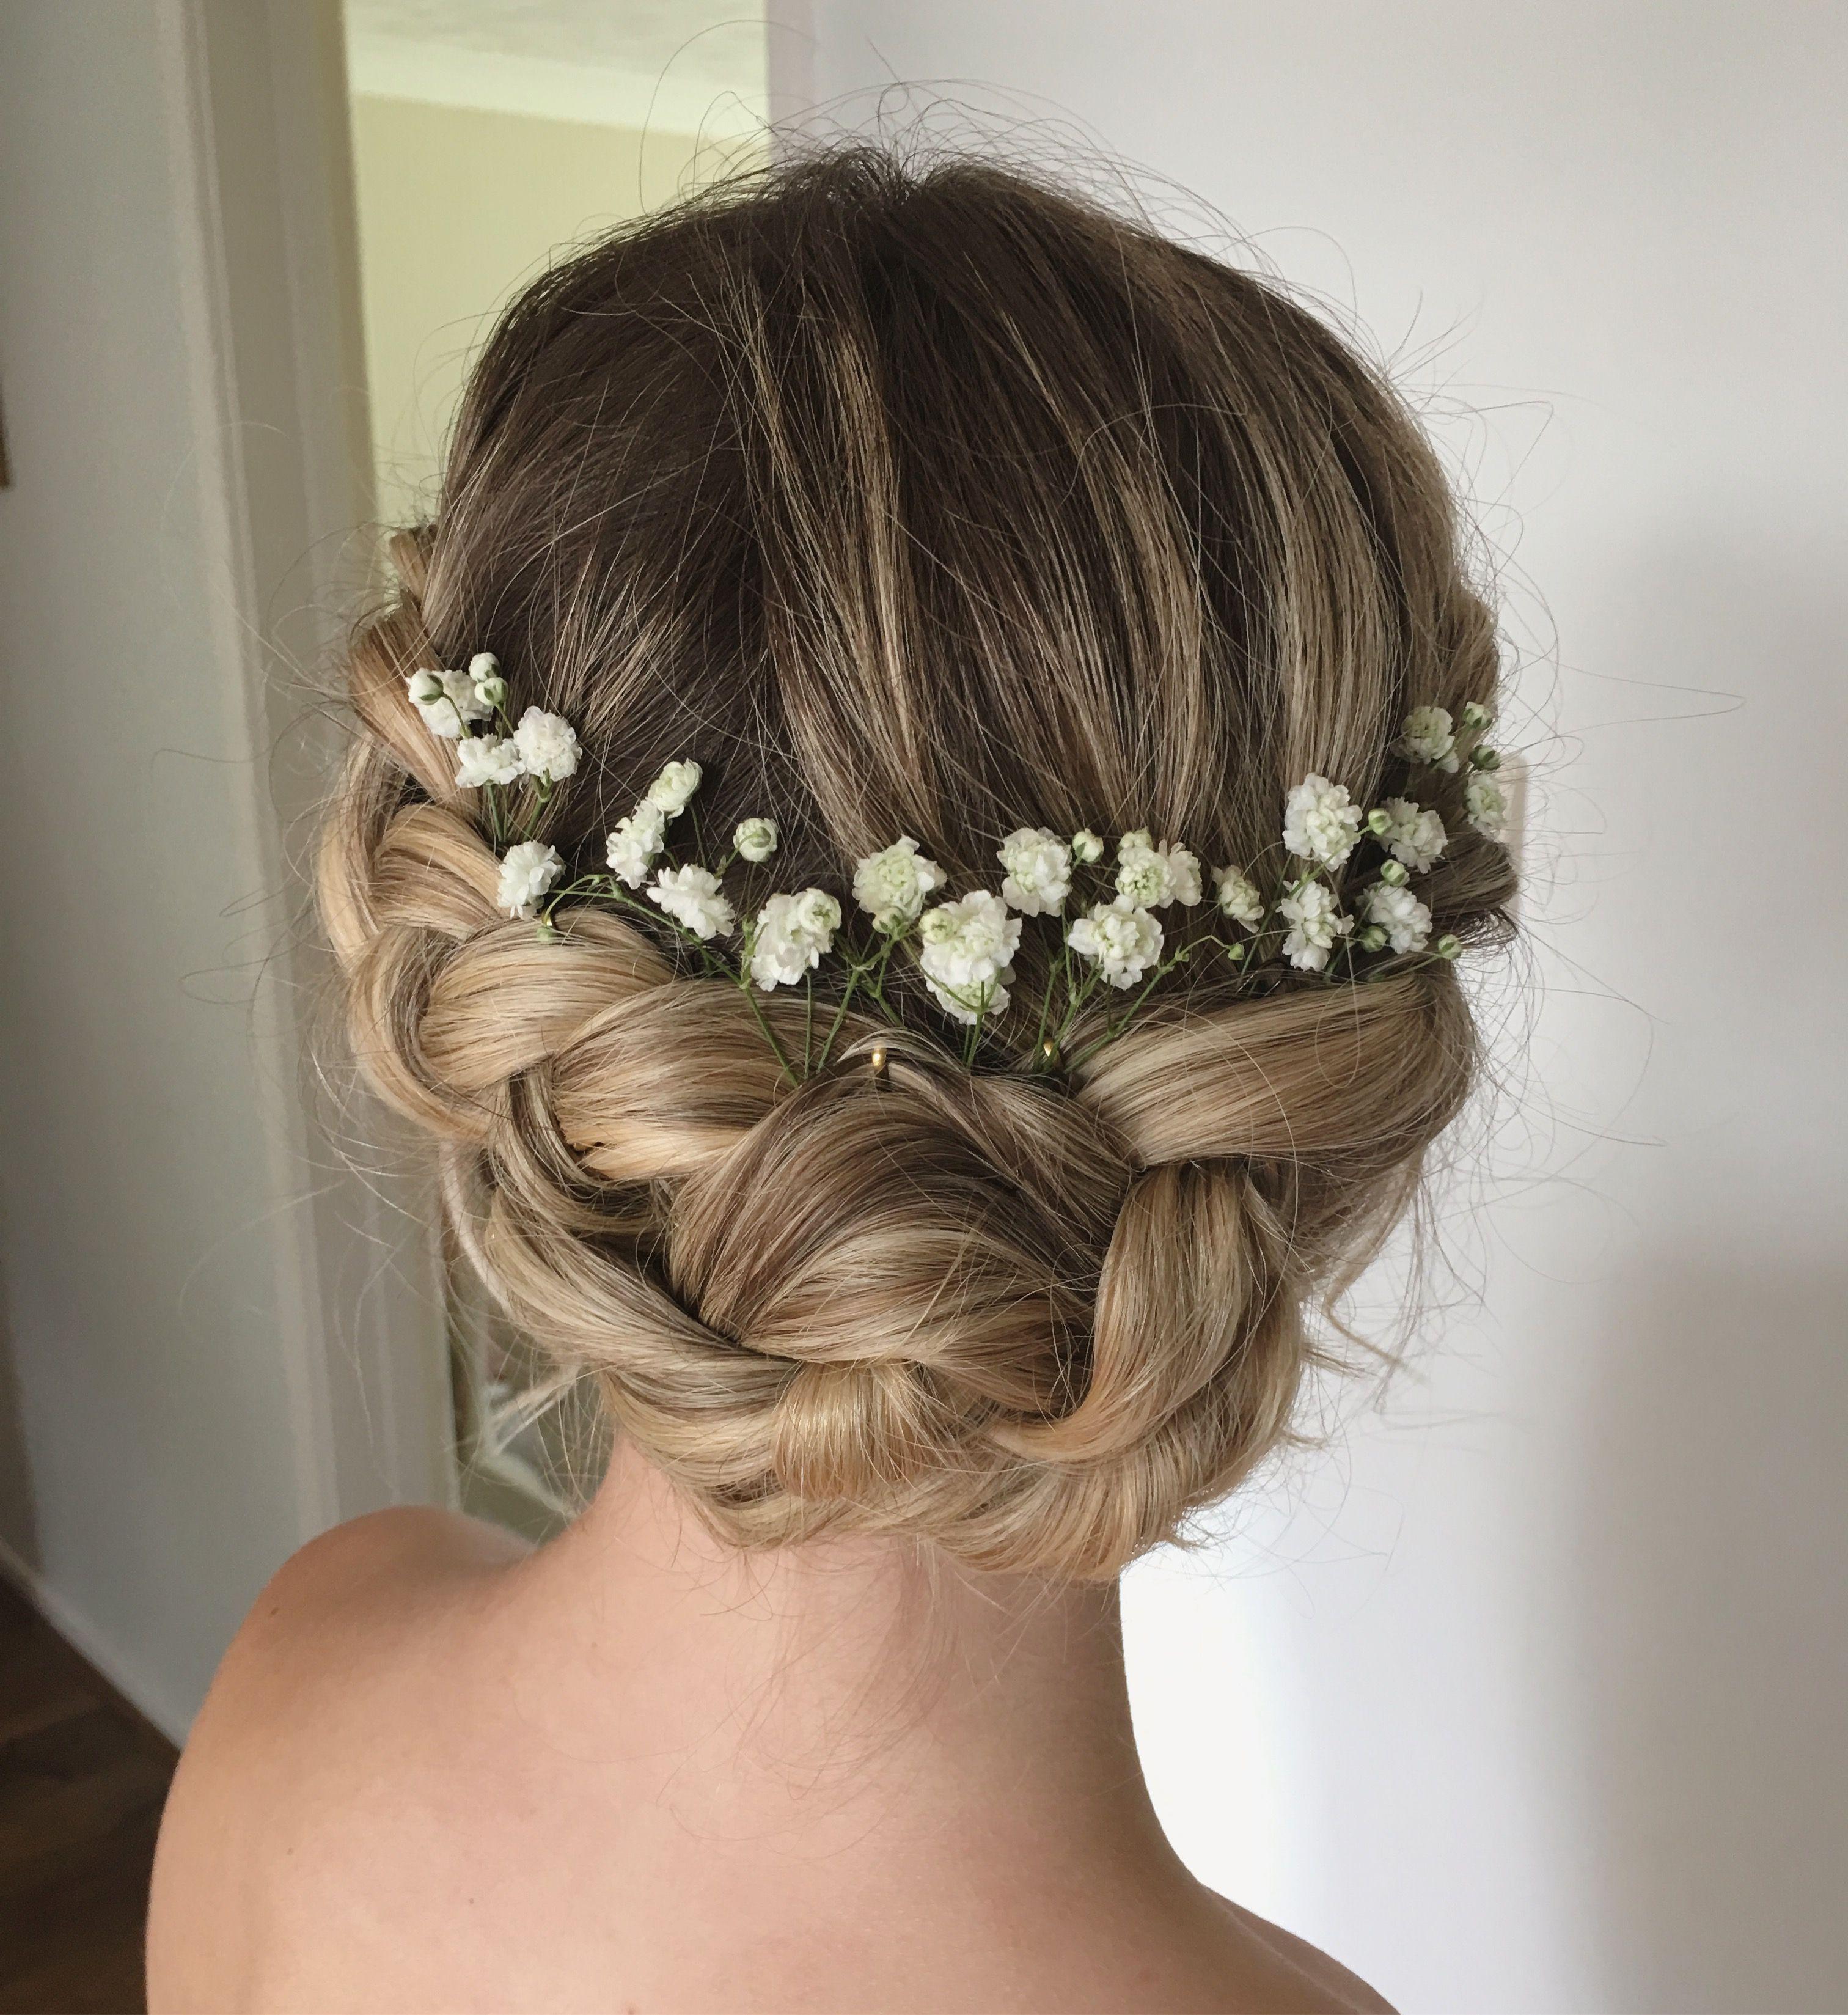 boho wedding hair. an updo with braids | my wedding hair in